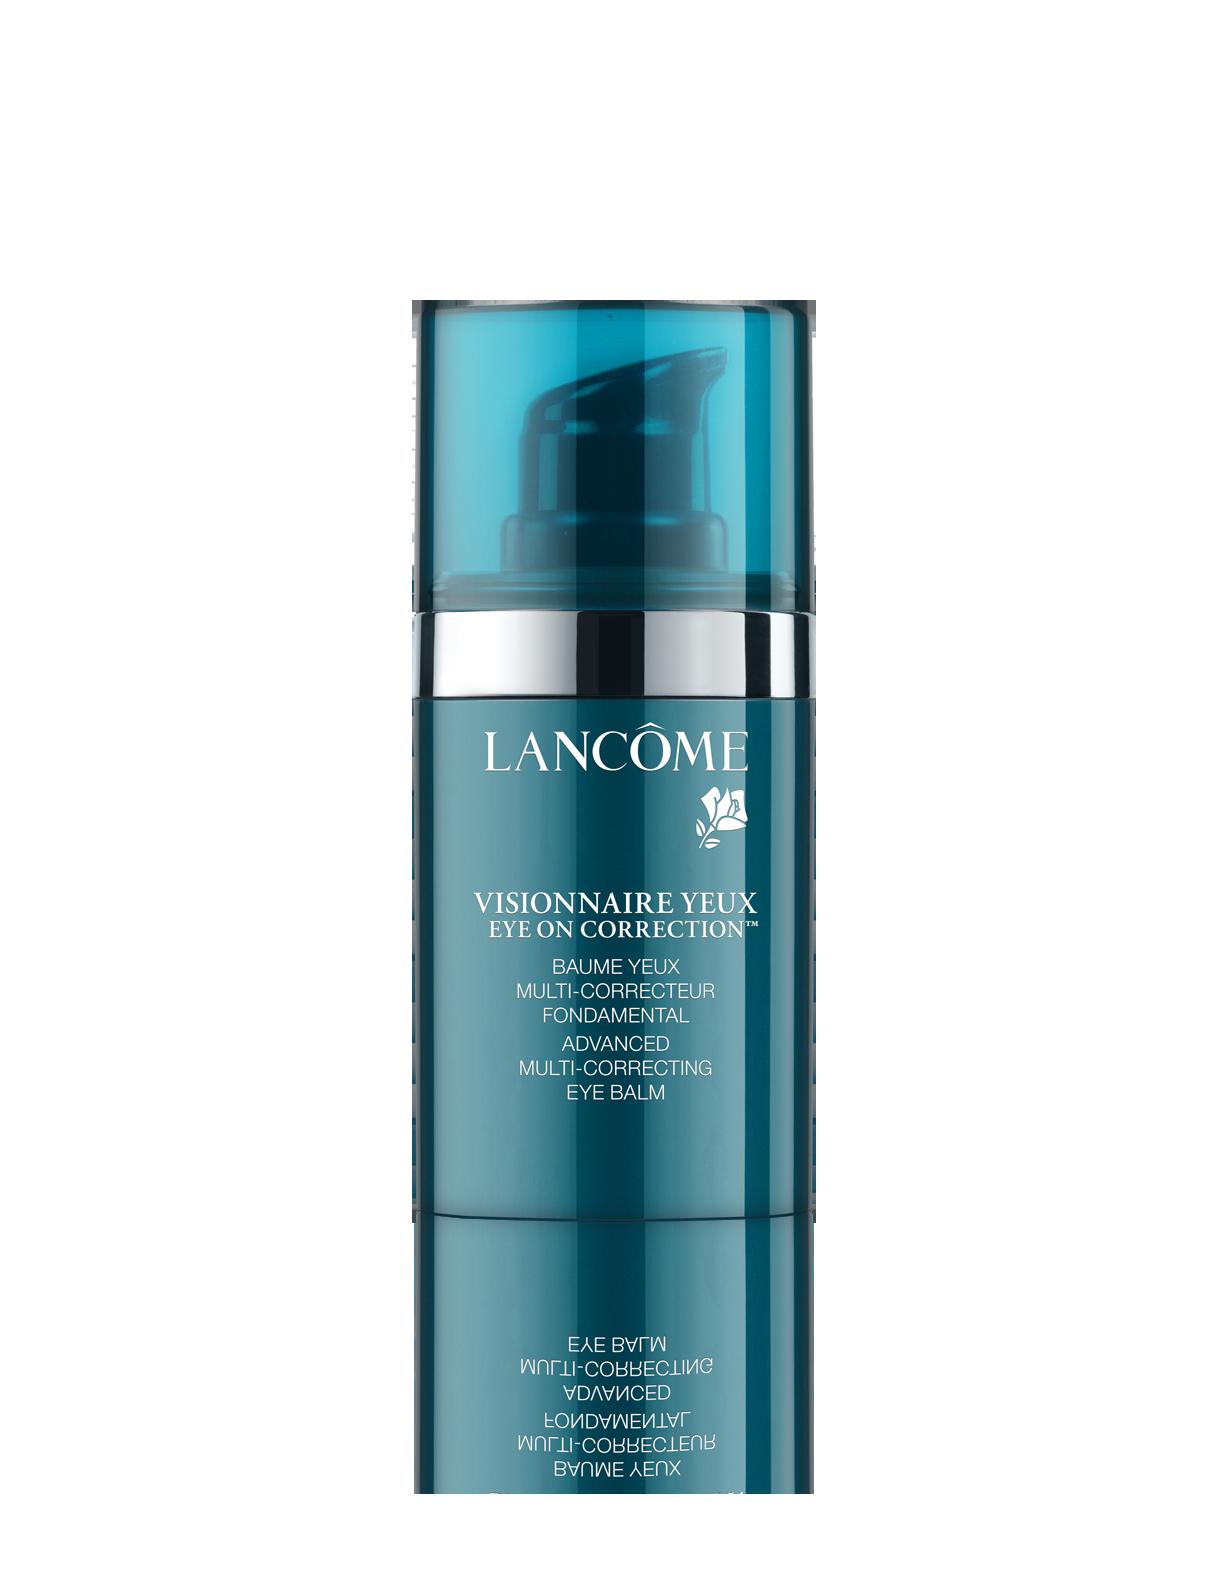 Lancôme Visionnaire Yeux Advanced Multi-Correcting Eye Balm